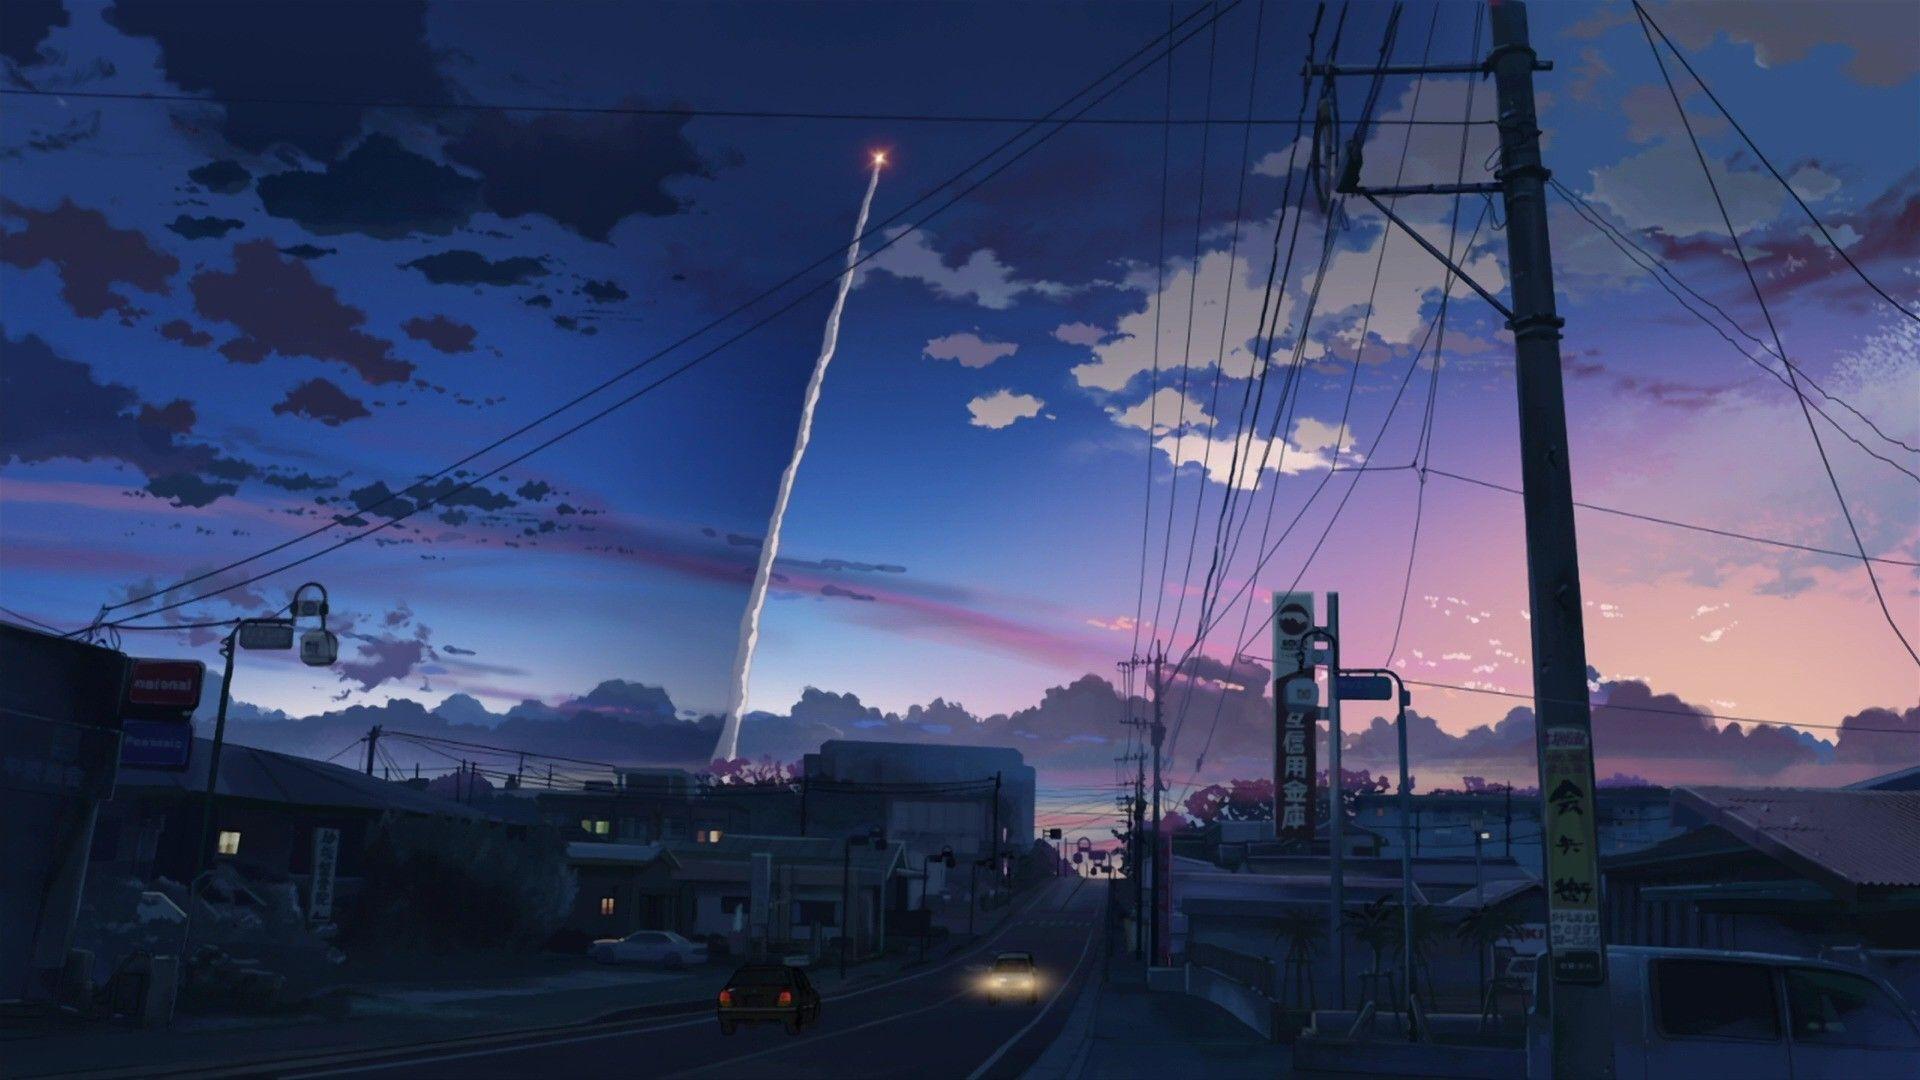 4k Wallpaper Anime Landscape Hd Art Wallpaper In 2020 Anime Scenery Anime Scenery Wallpaper Scenery Wallpaper